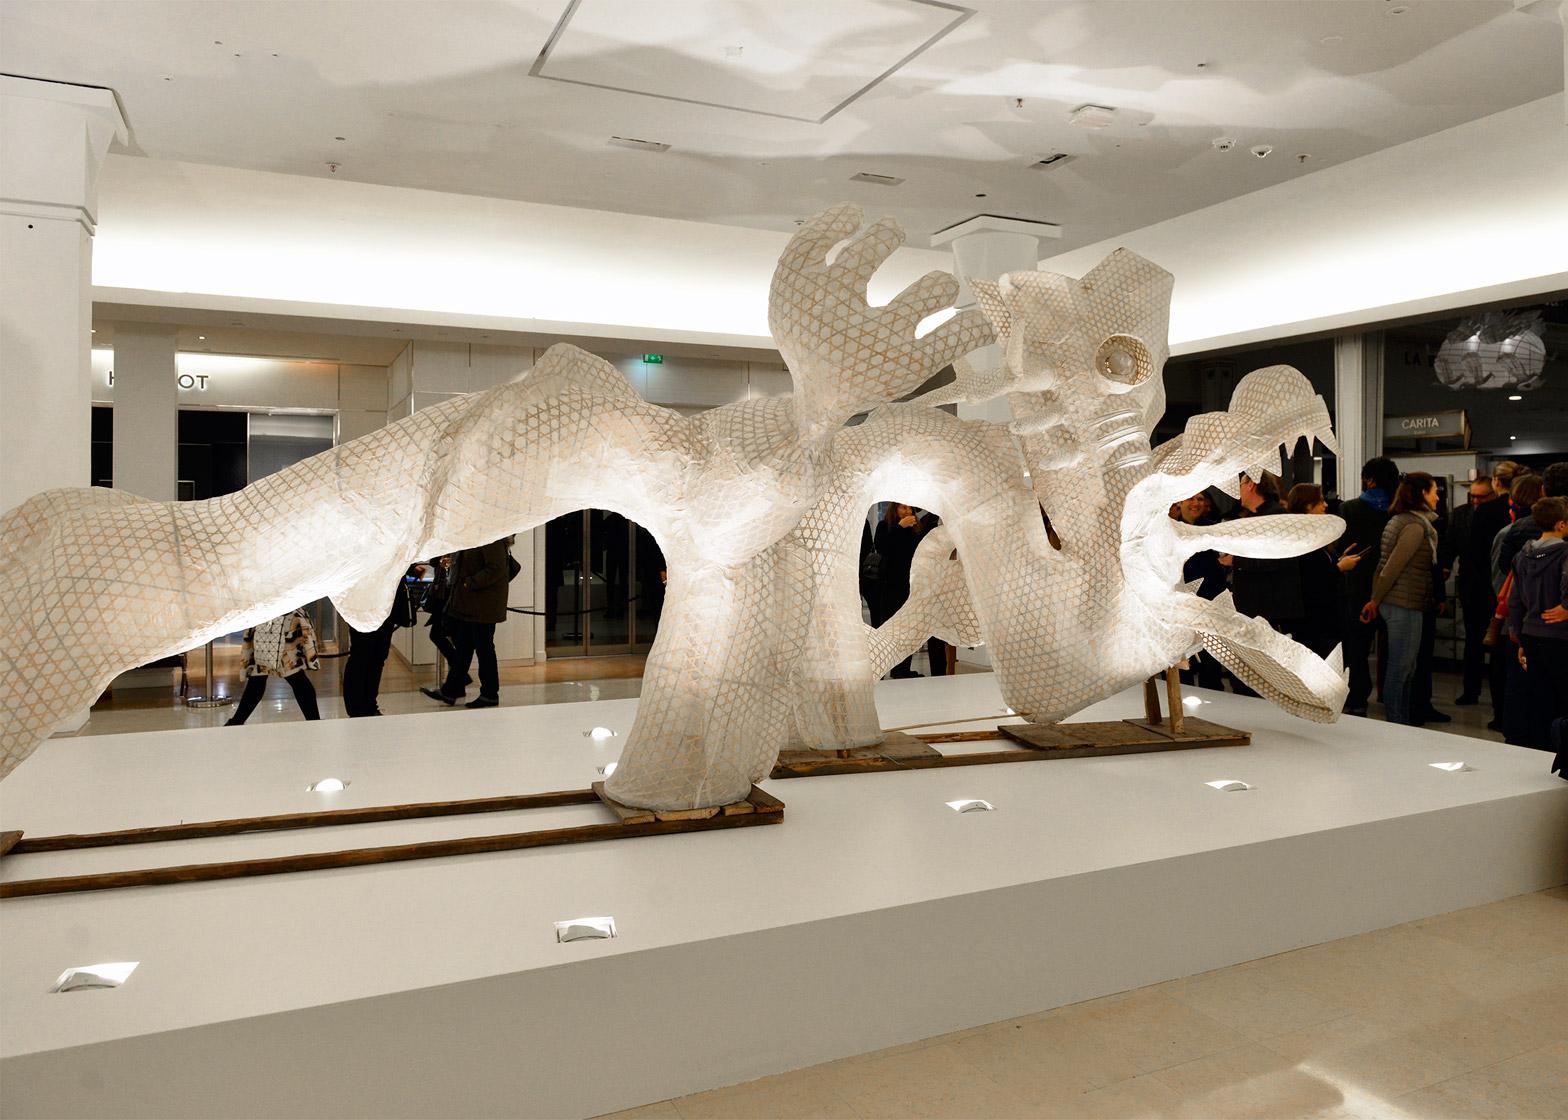 ai-wei-wei-er-xi-exhibition-le-bon-marche-2016_dezeen_1568_1.jpg